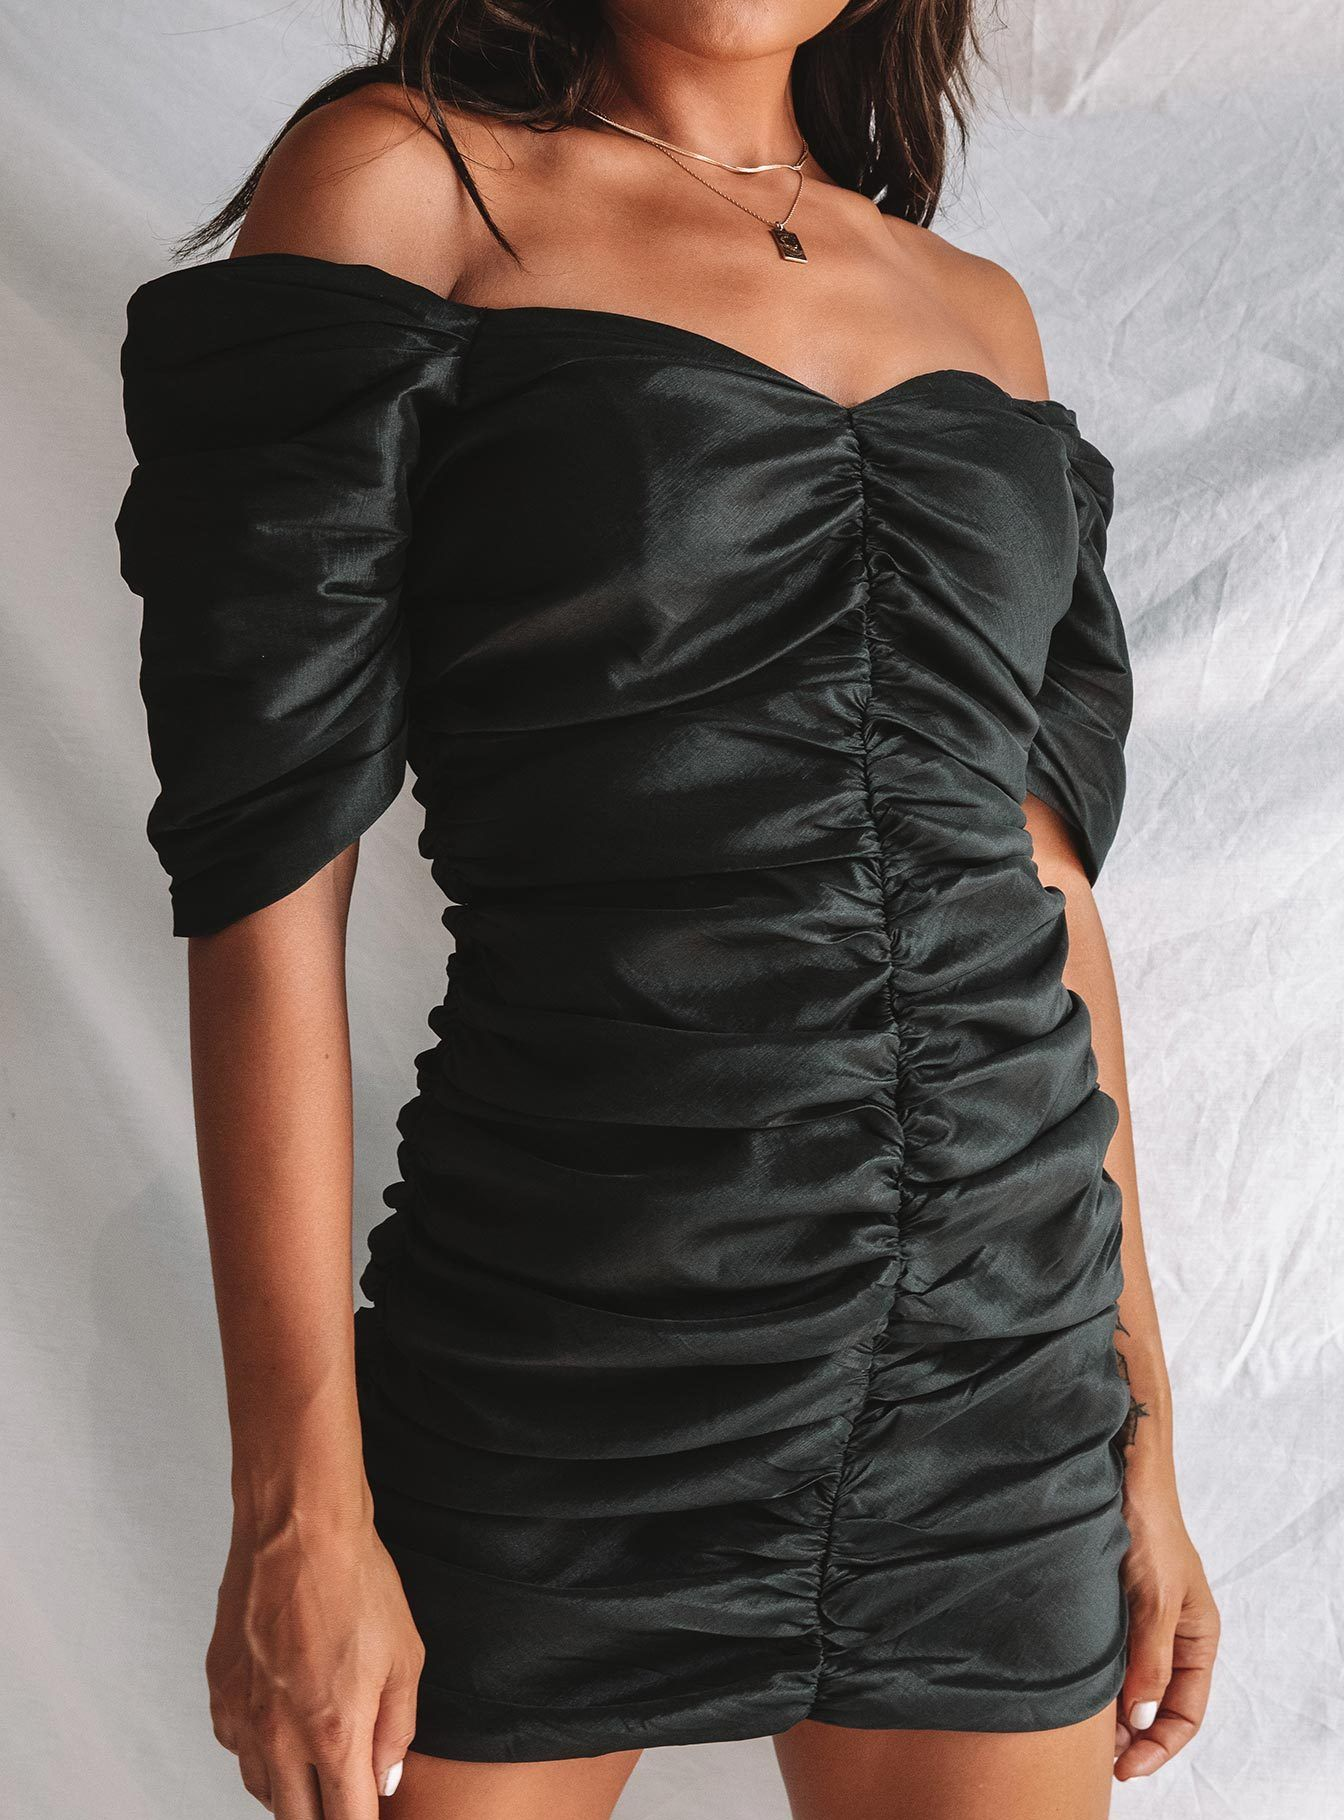 Delpha Mini Dress Mini Dress All Black Dresses Dresses [ 1820 x 1344 Pixel ]